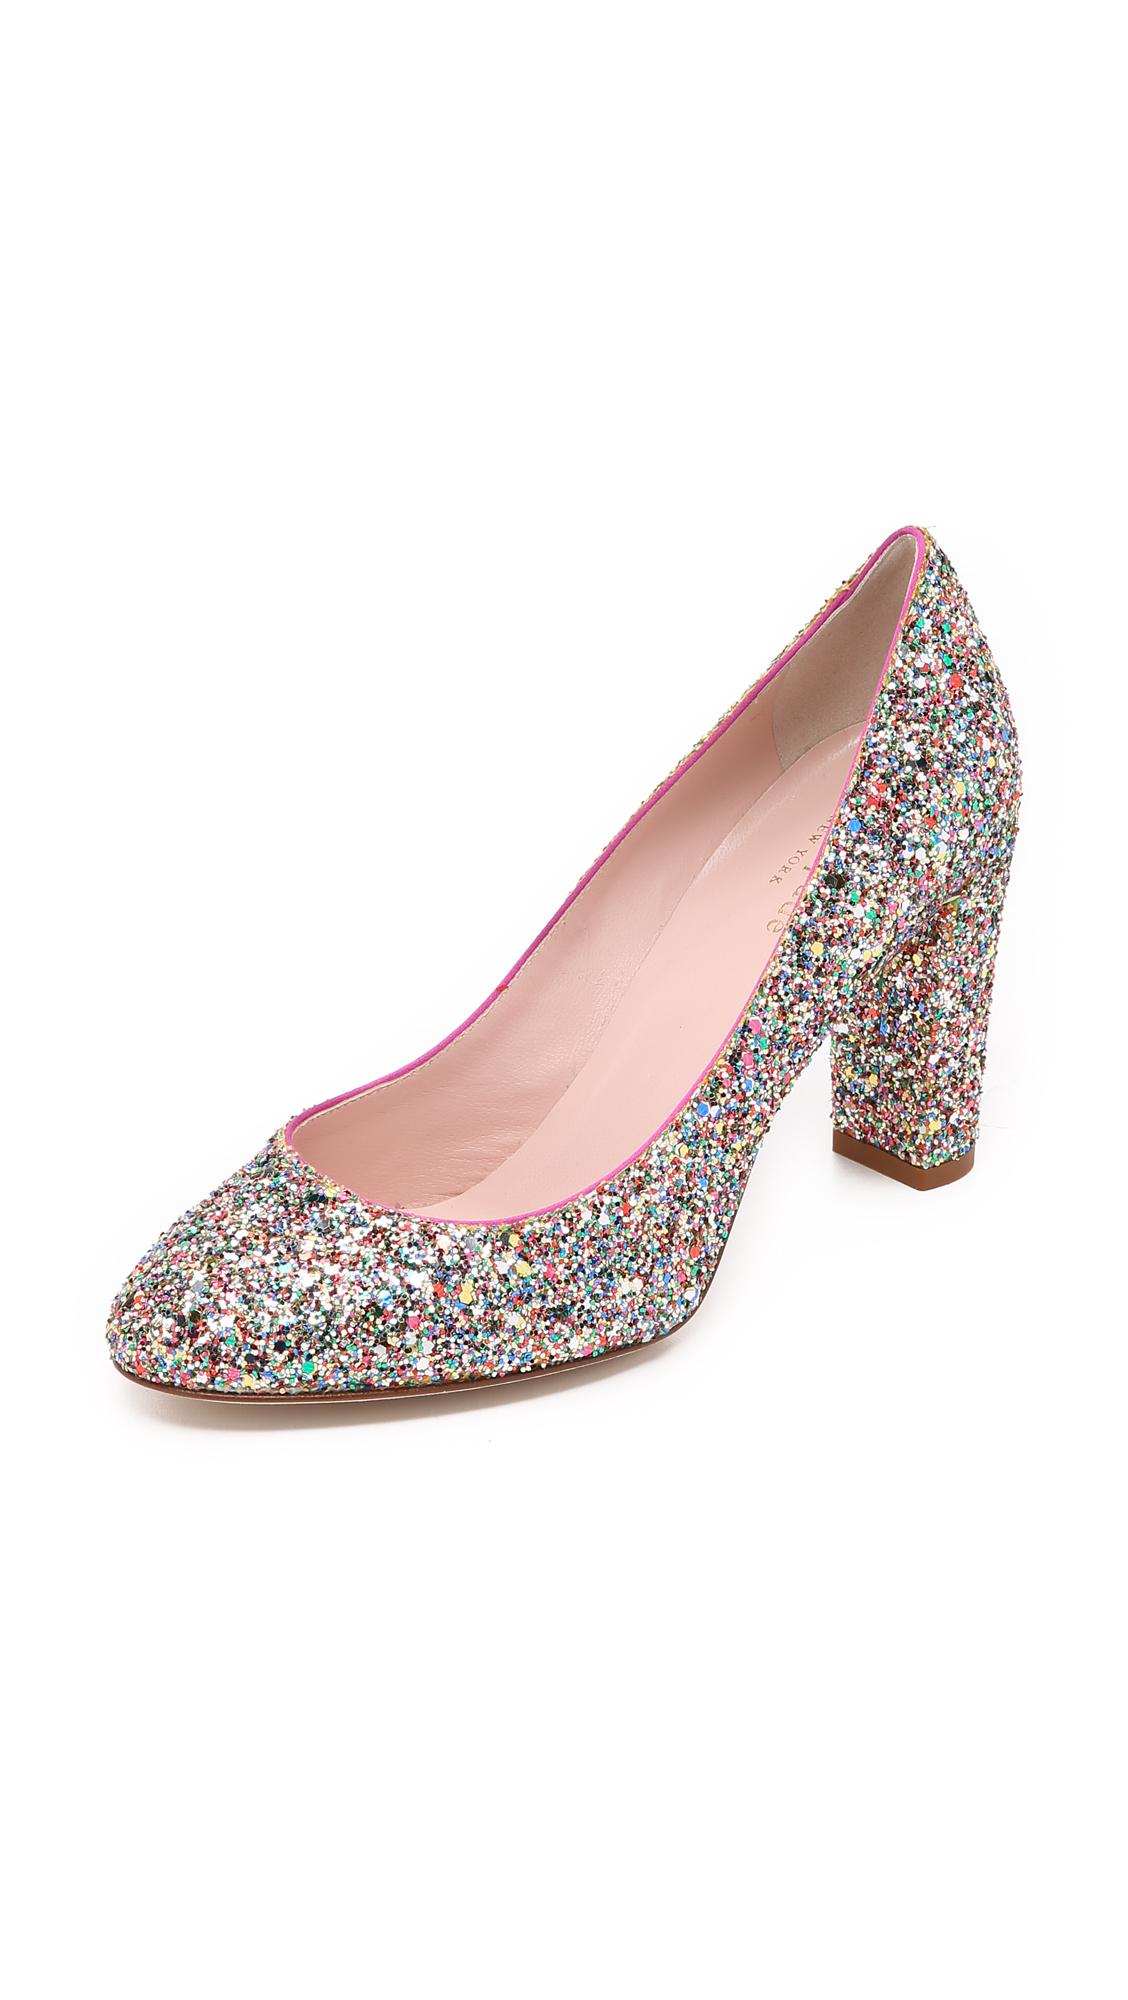 Kate Spade New York Dani Too Glitter Pumps